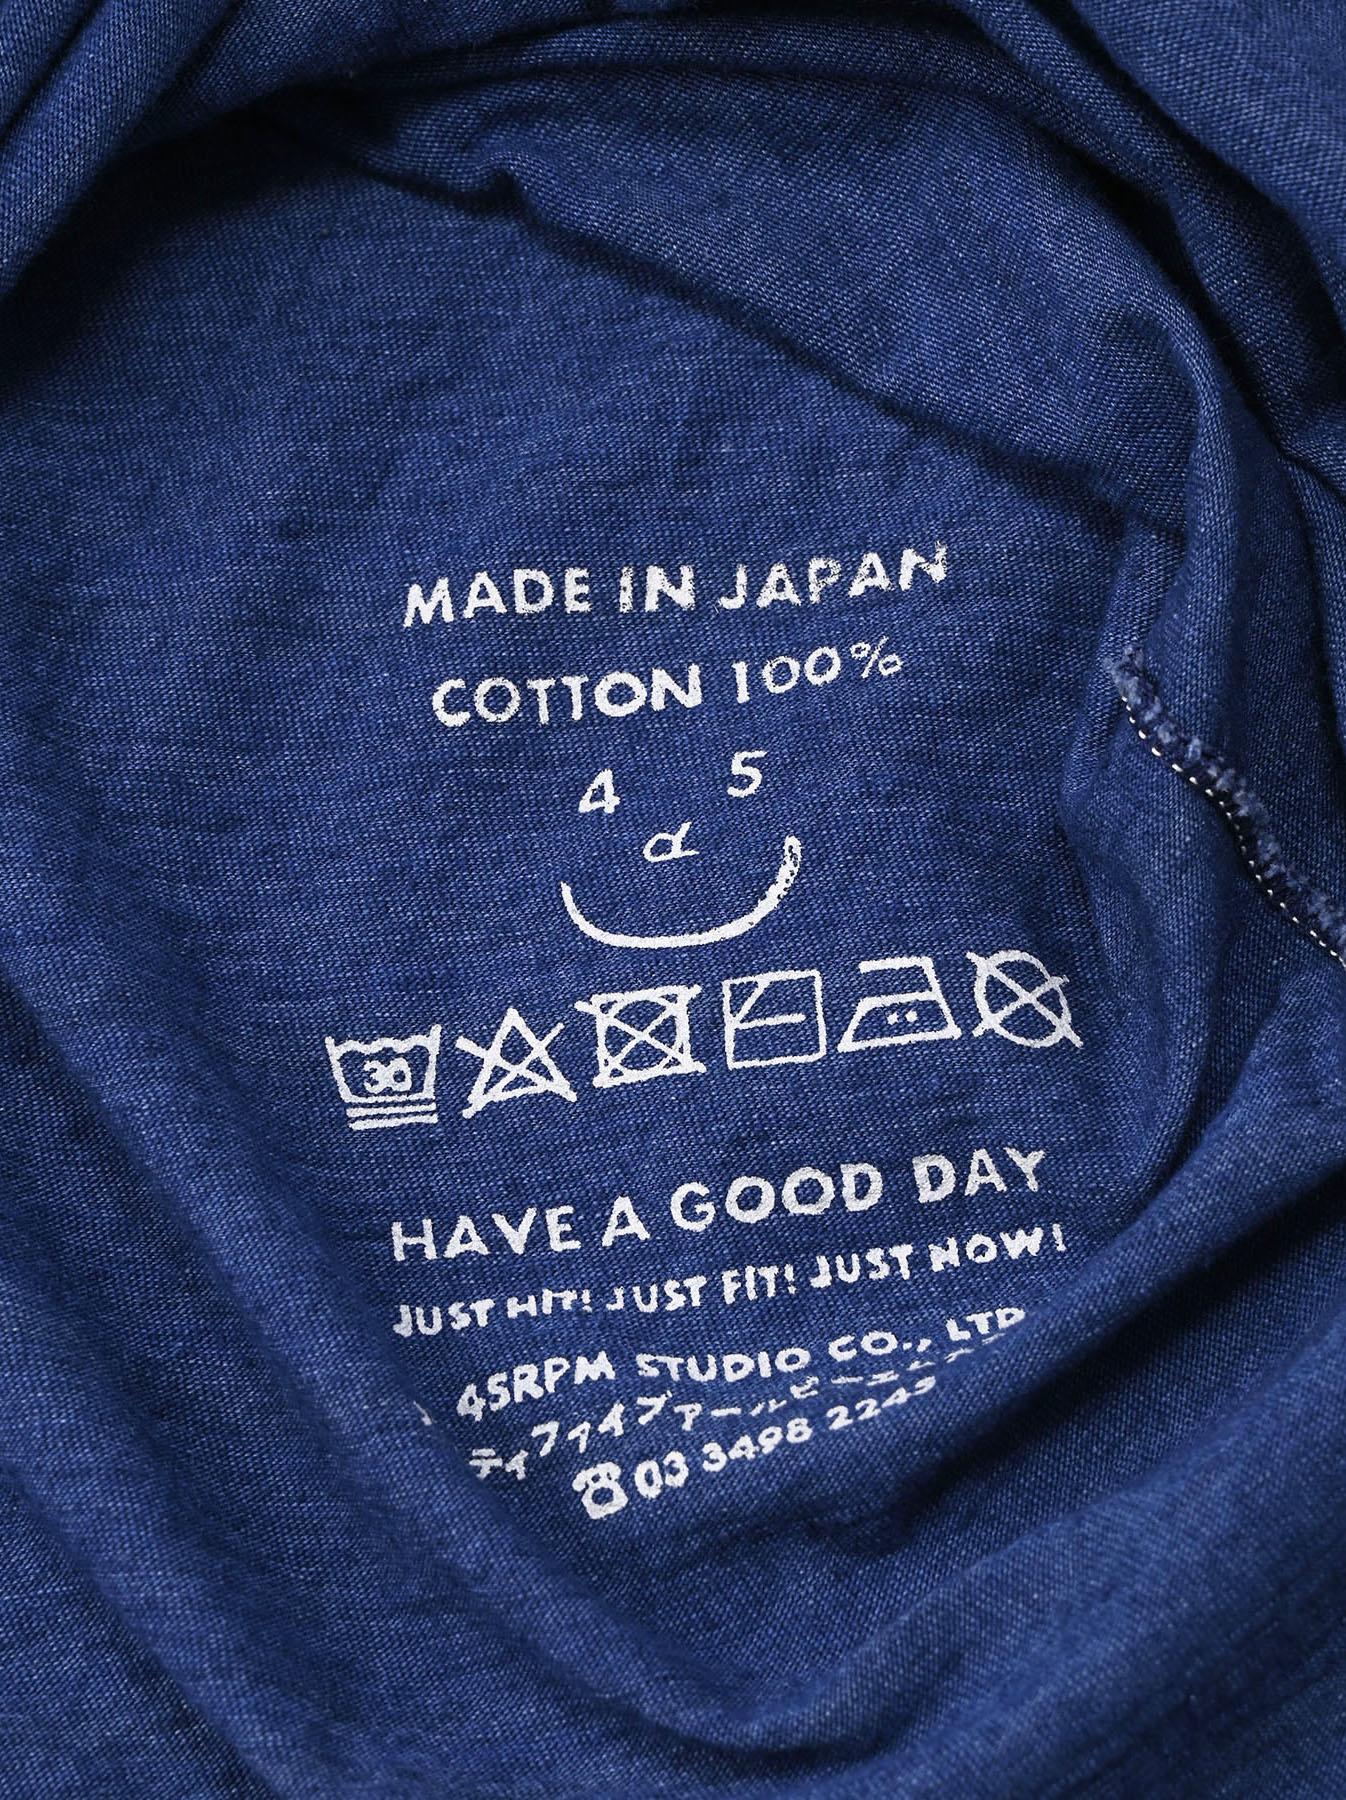 Distressed Indigo Lei Lei Print Big Slit T-shirt (0621)-12